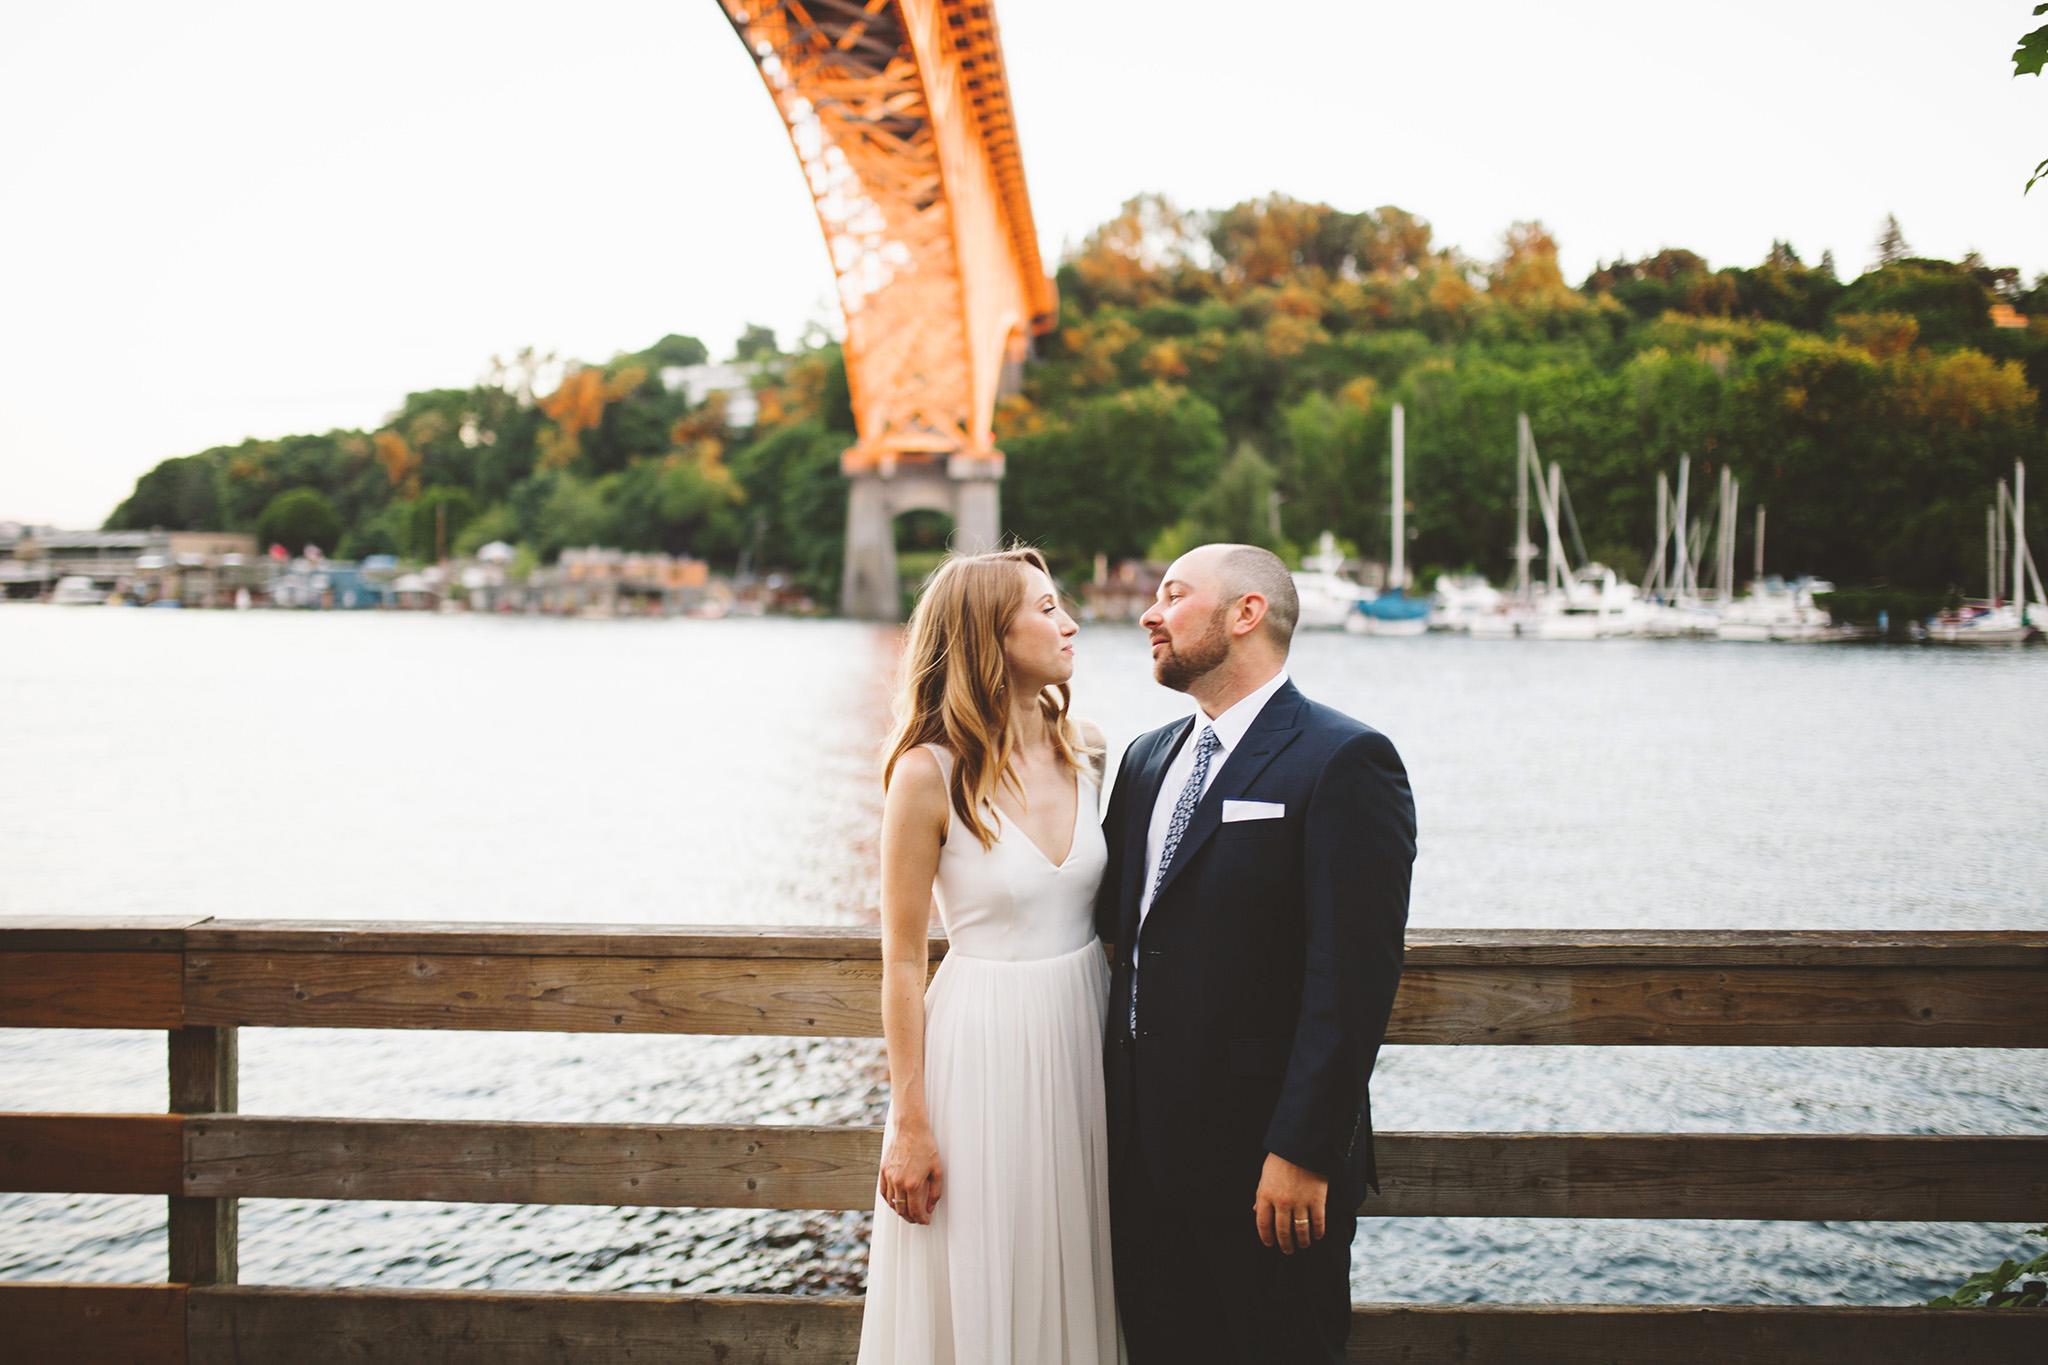 summer Rooftop wedding in Seattle